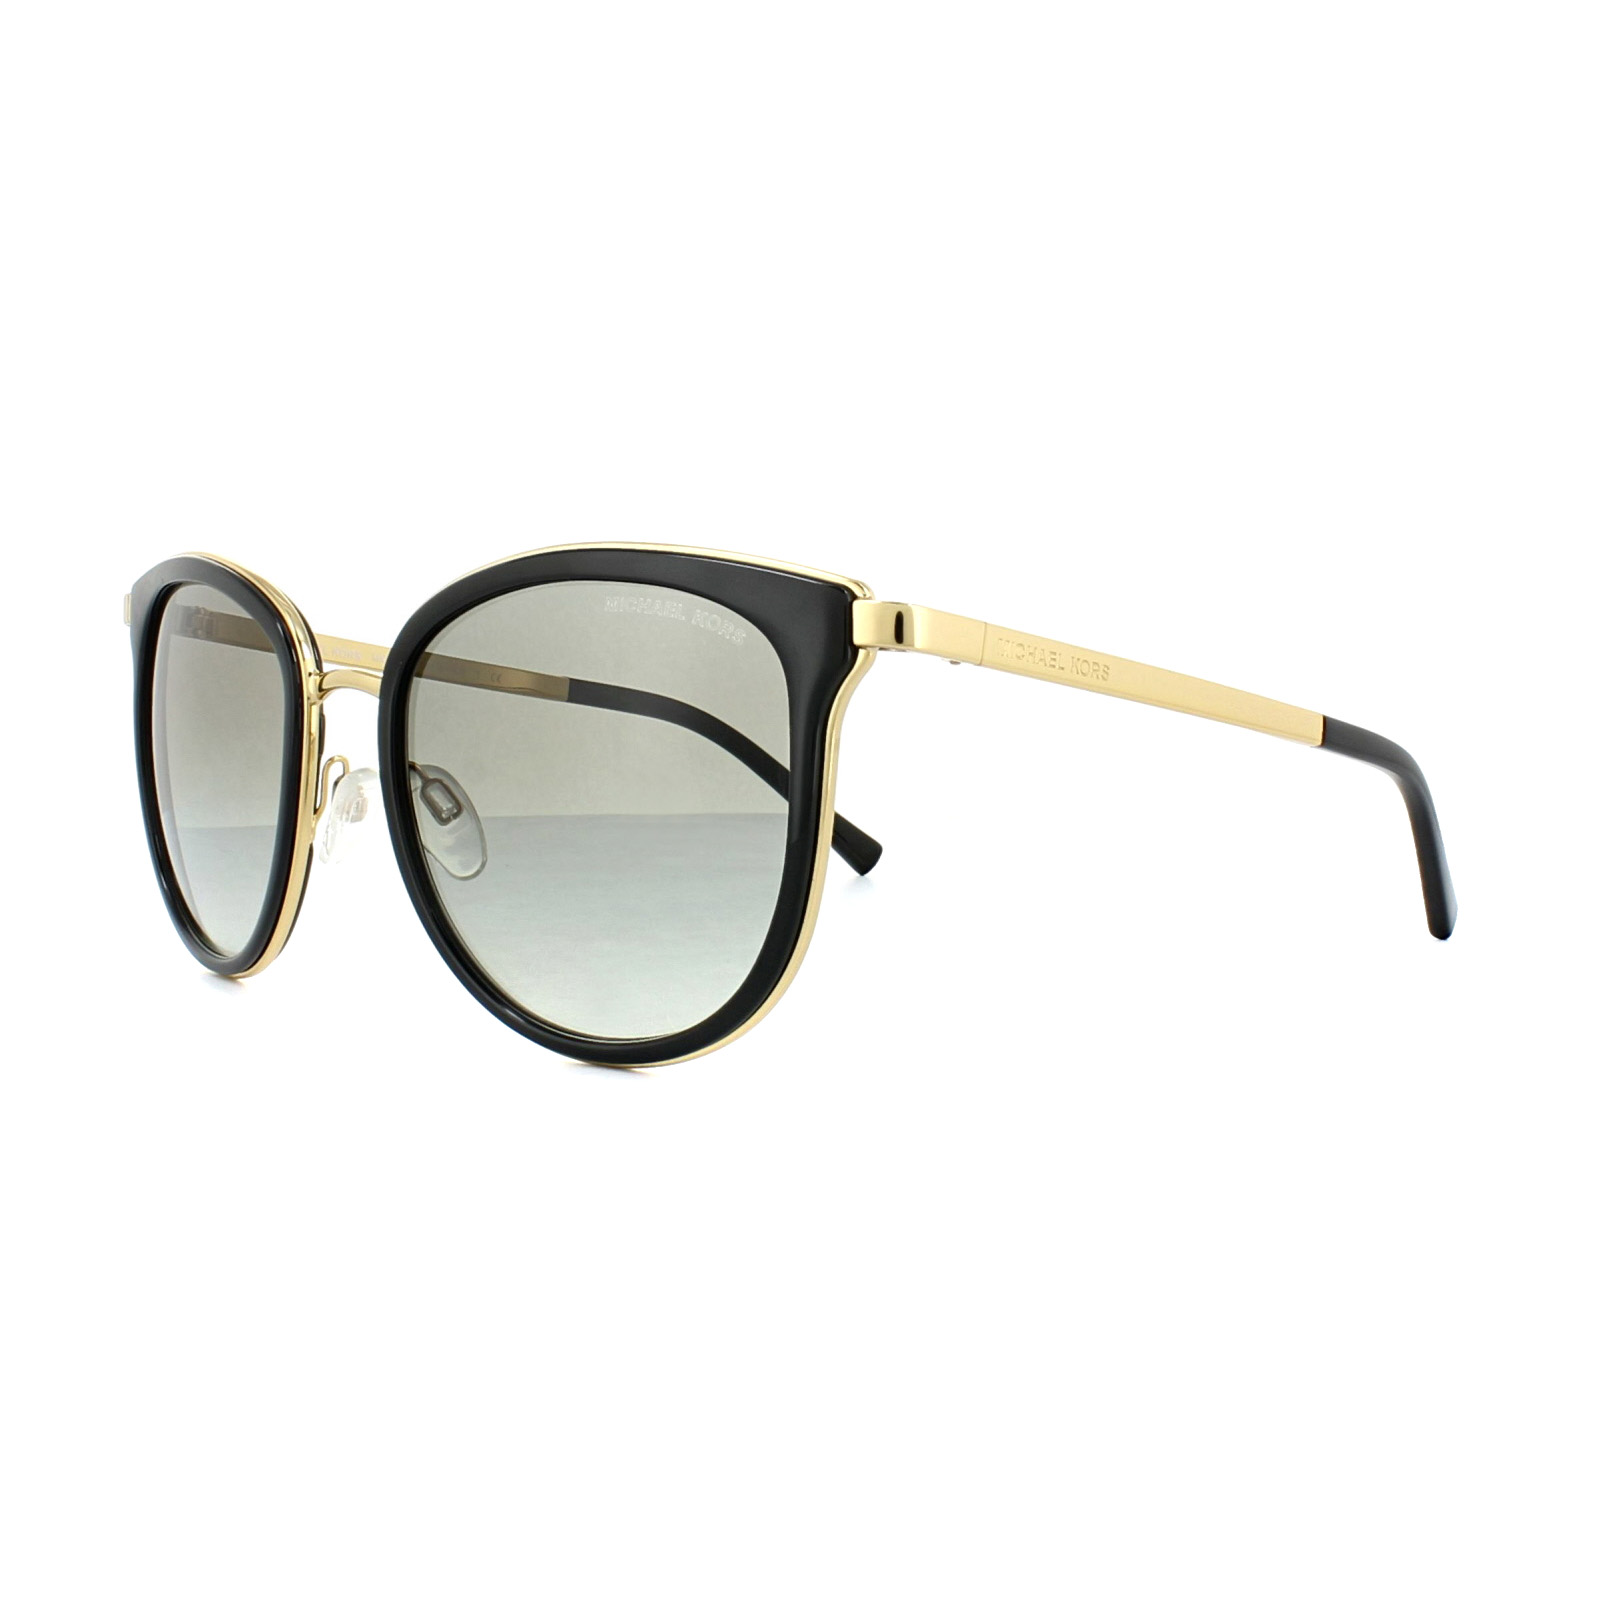 a975f276a933 Cheap Michael Kors Adrianna 1 1010 Sunglasses - Discounted Sunglasses